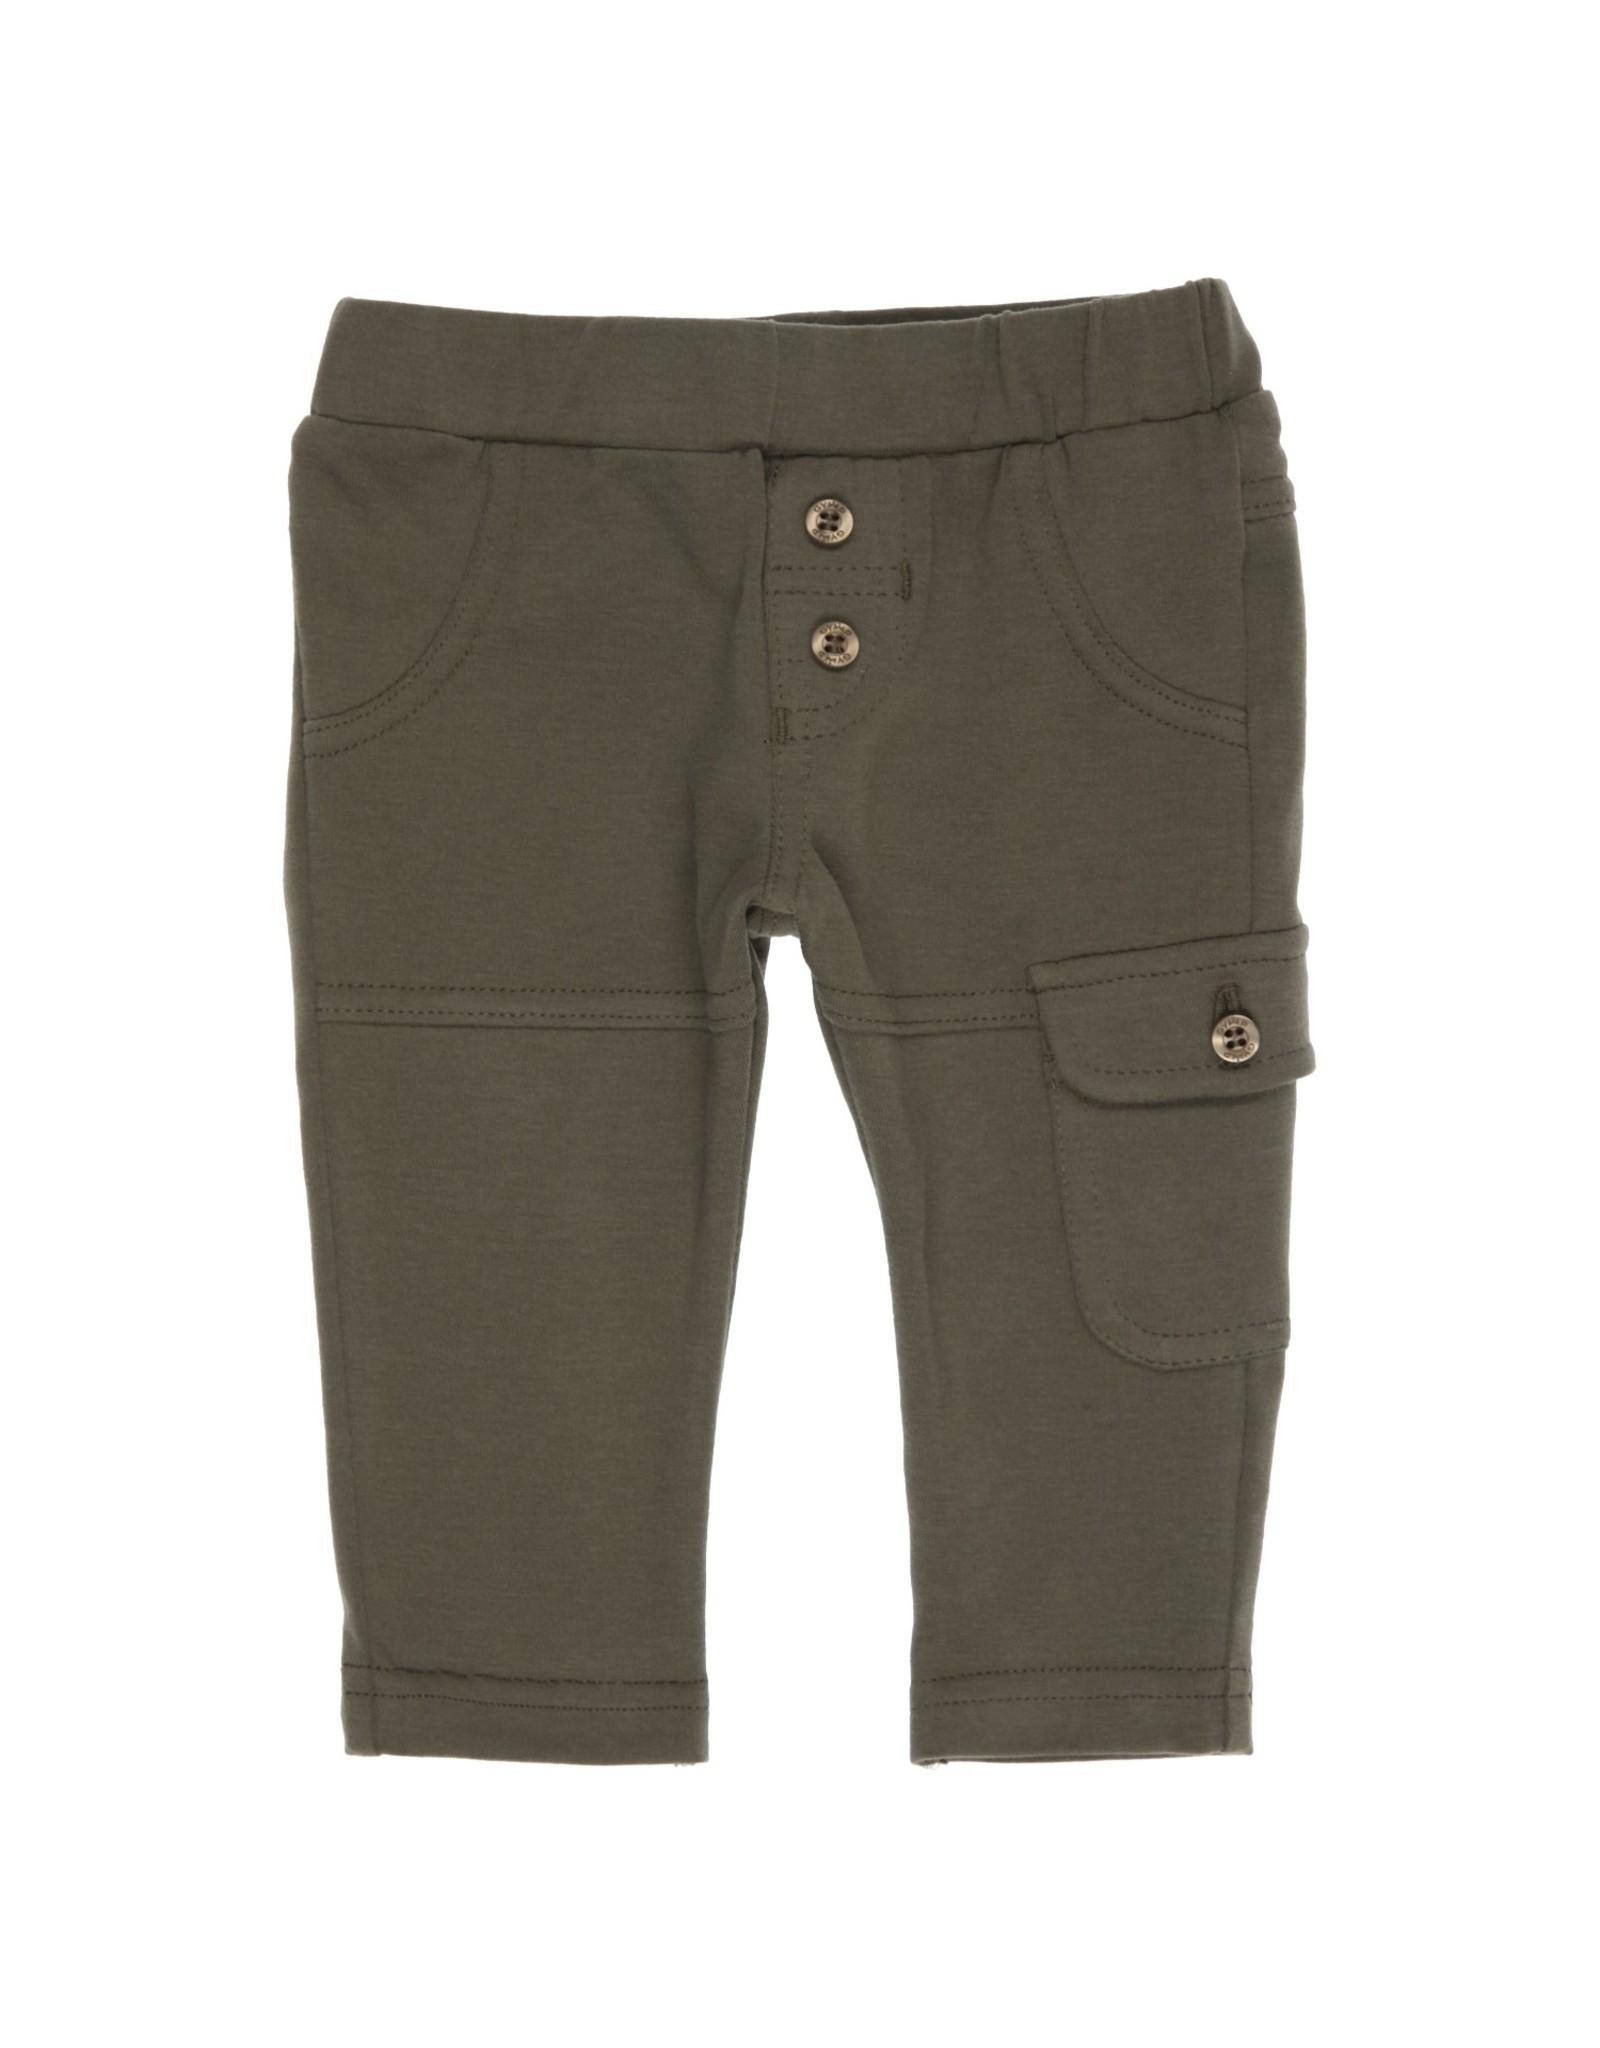 Gymp Pantalon - Side Pocket - Aerod Kaki